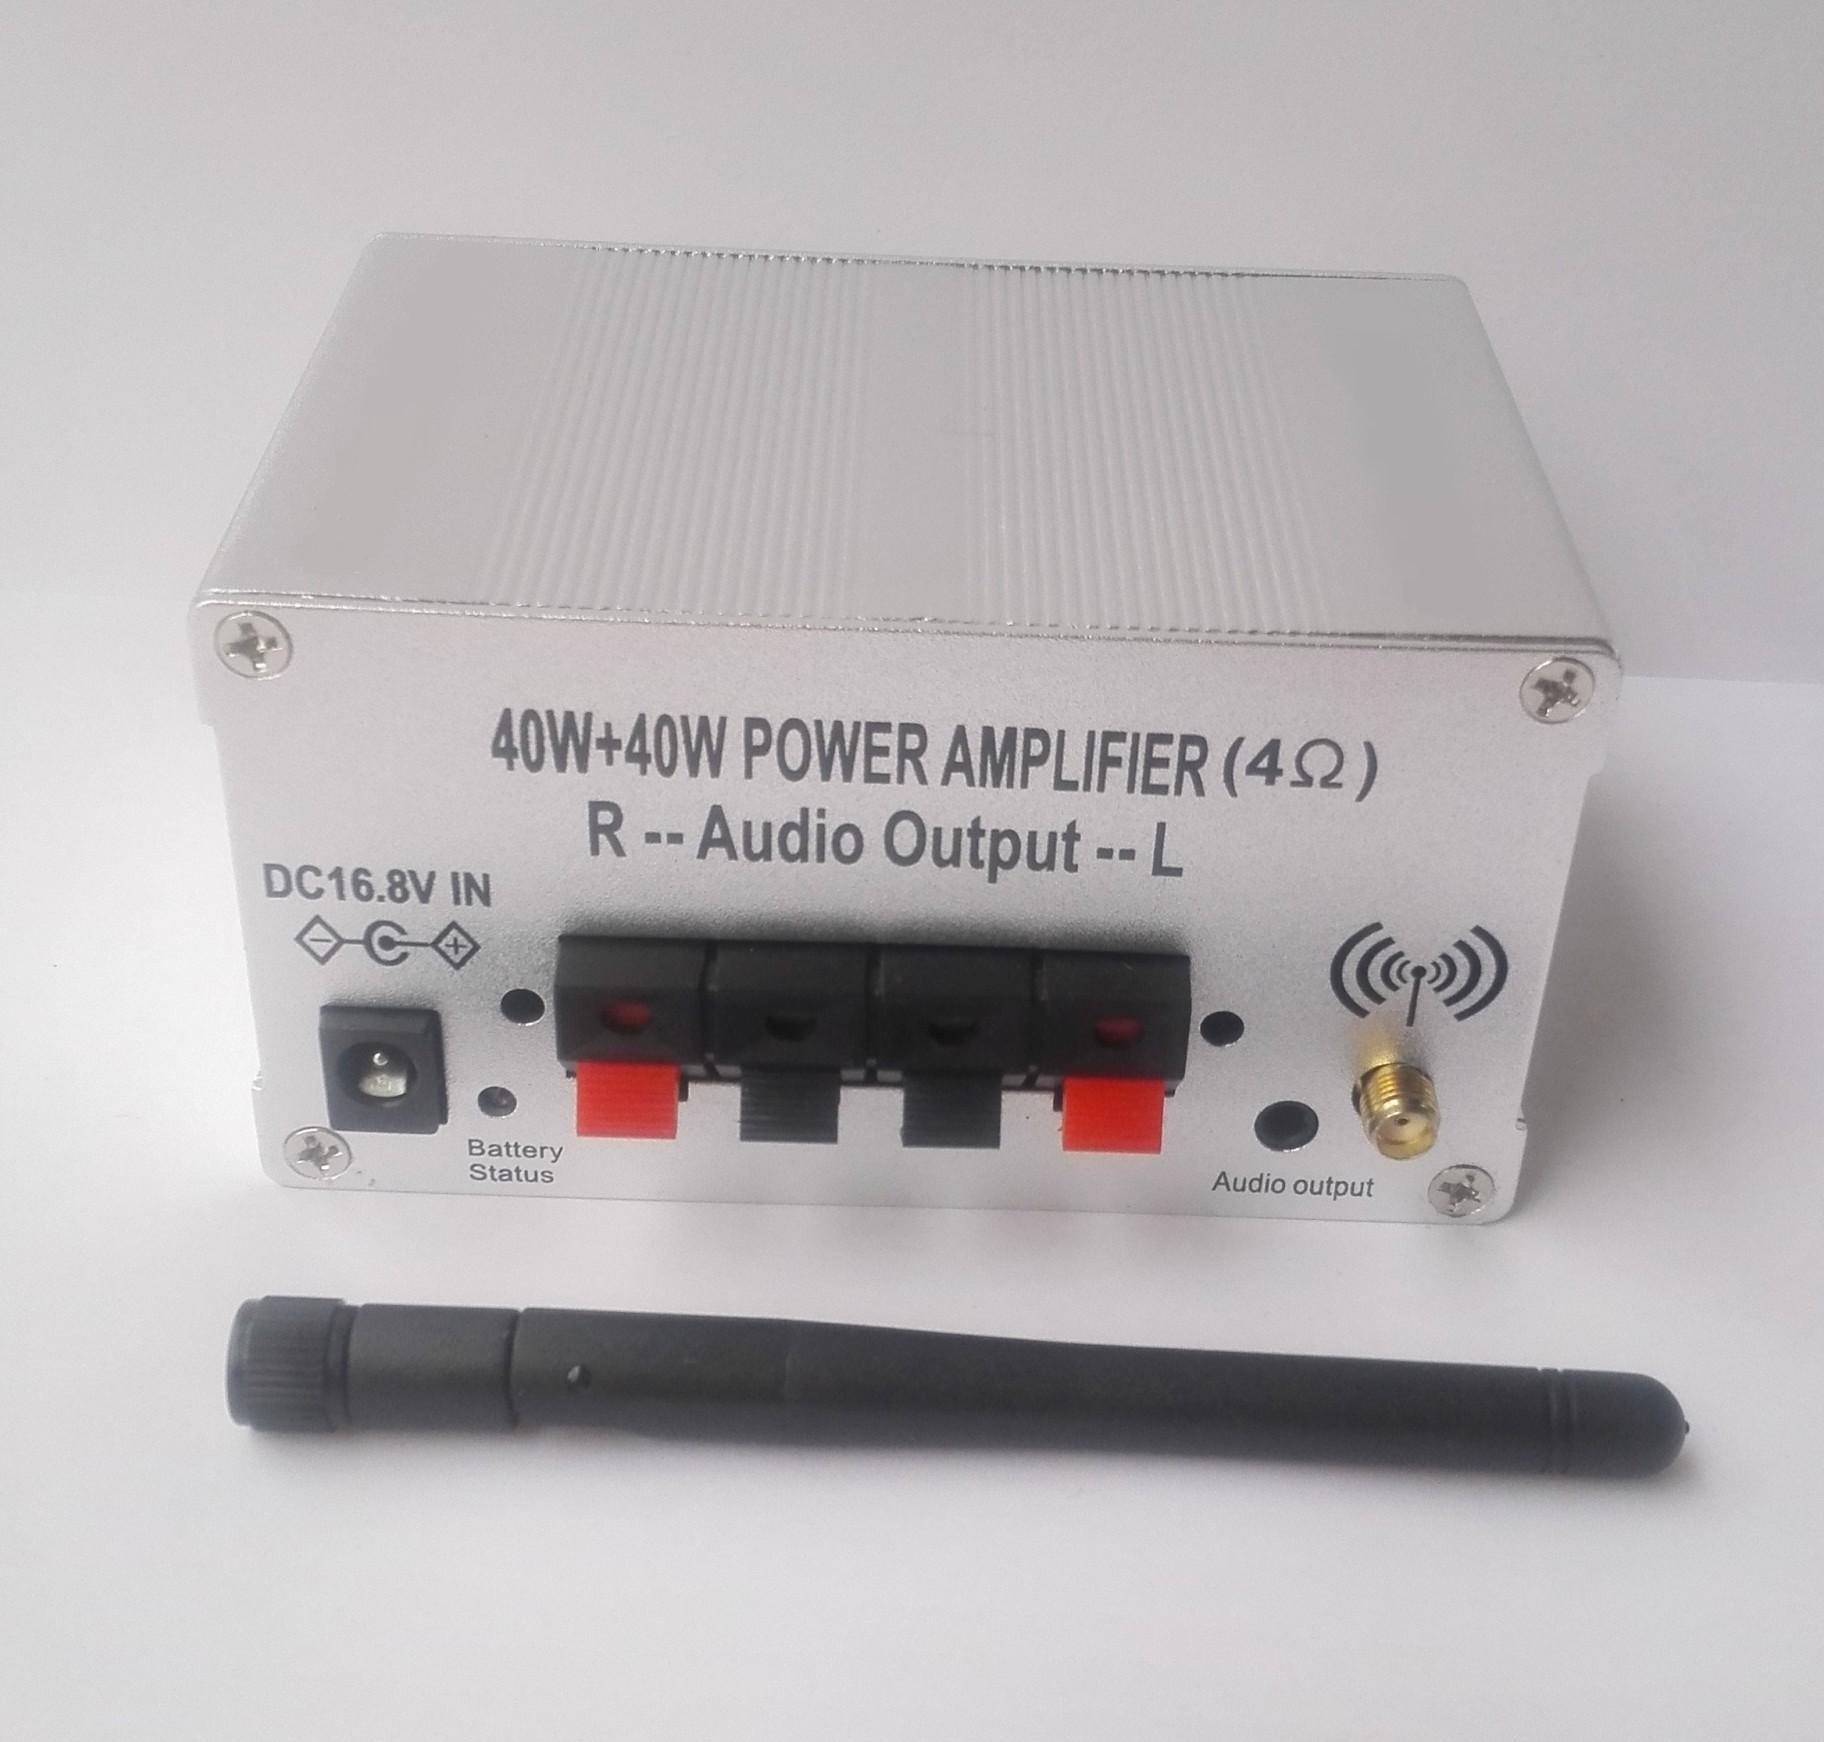 Bluetooth power amplifier 40W and 40W output Built in batte4000mAh external spe 4